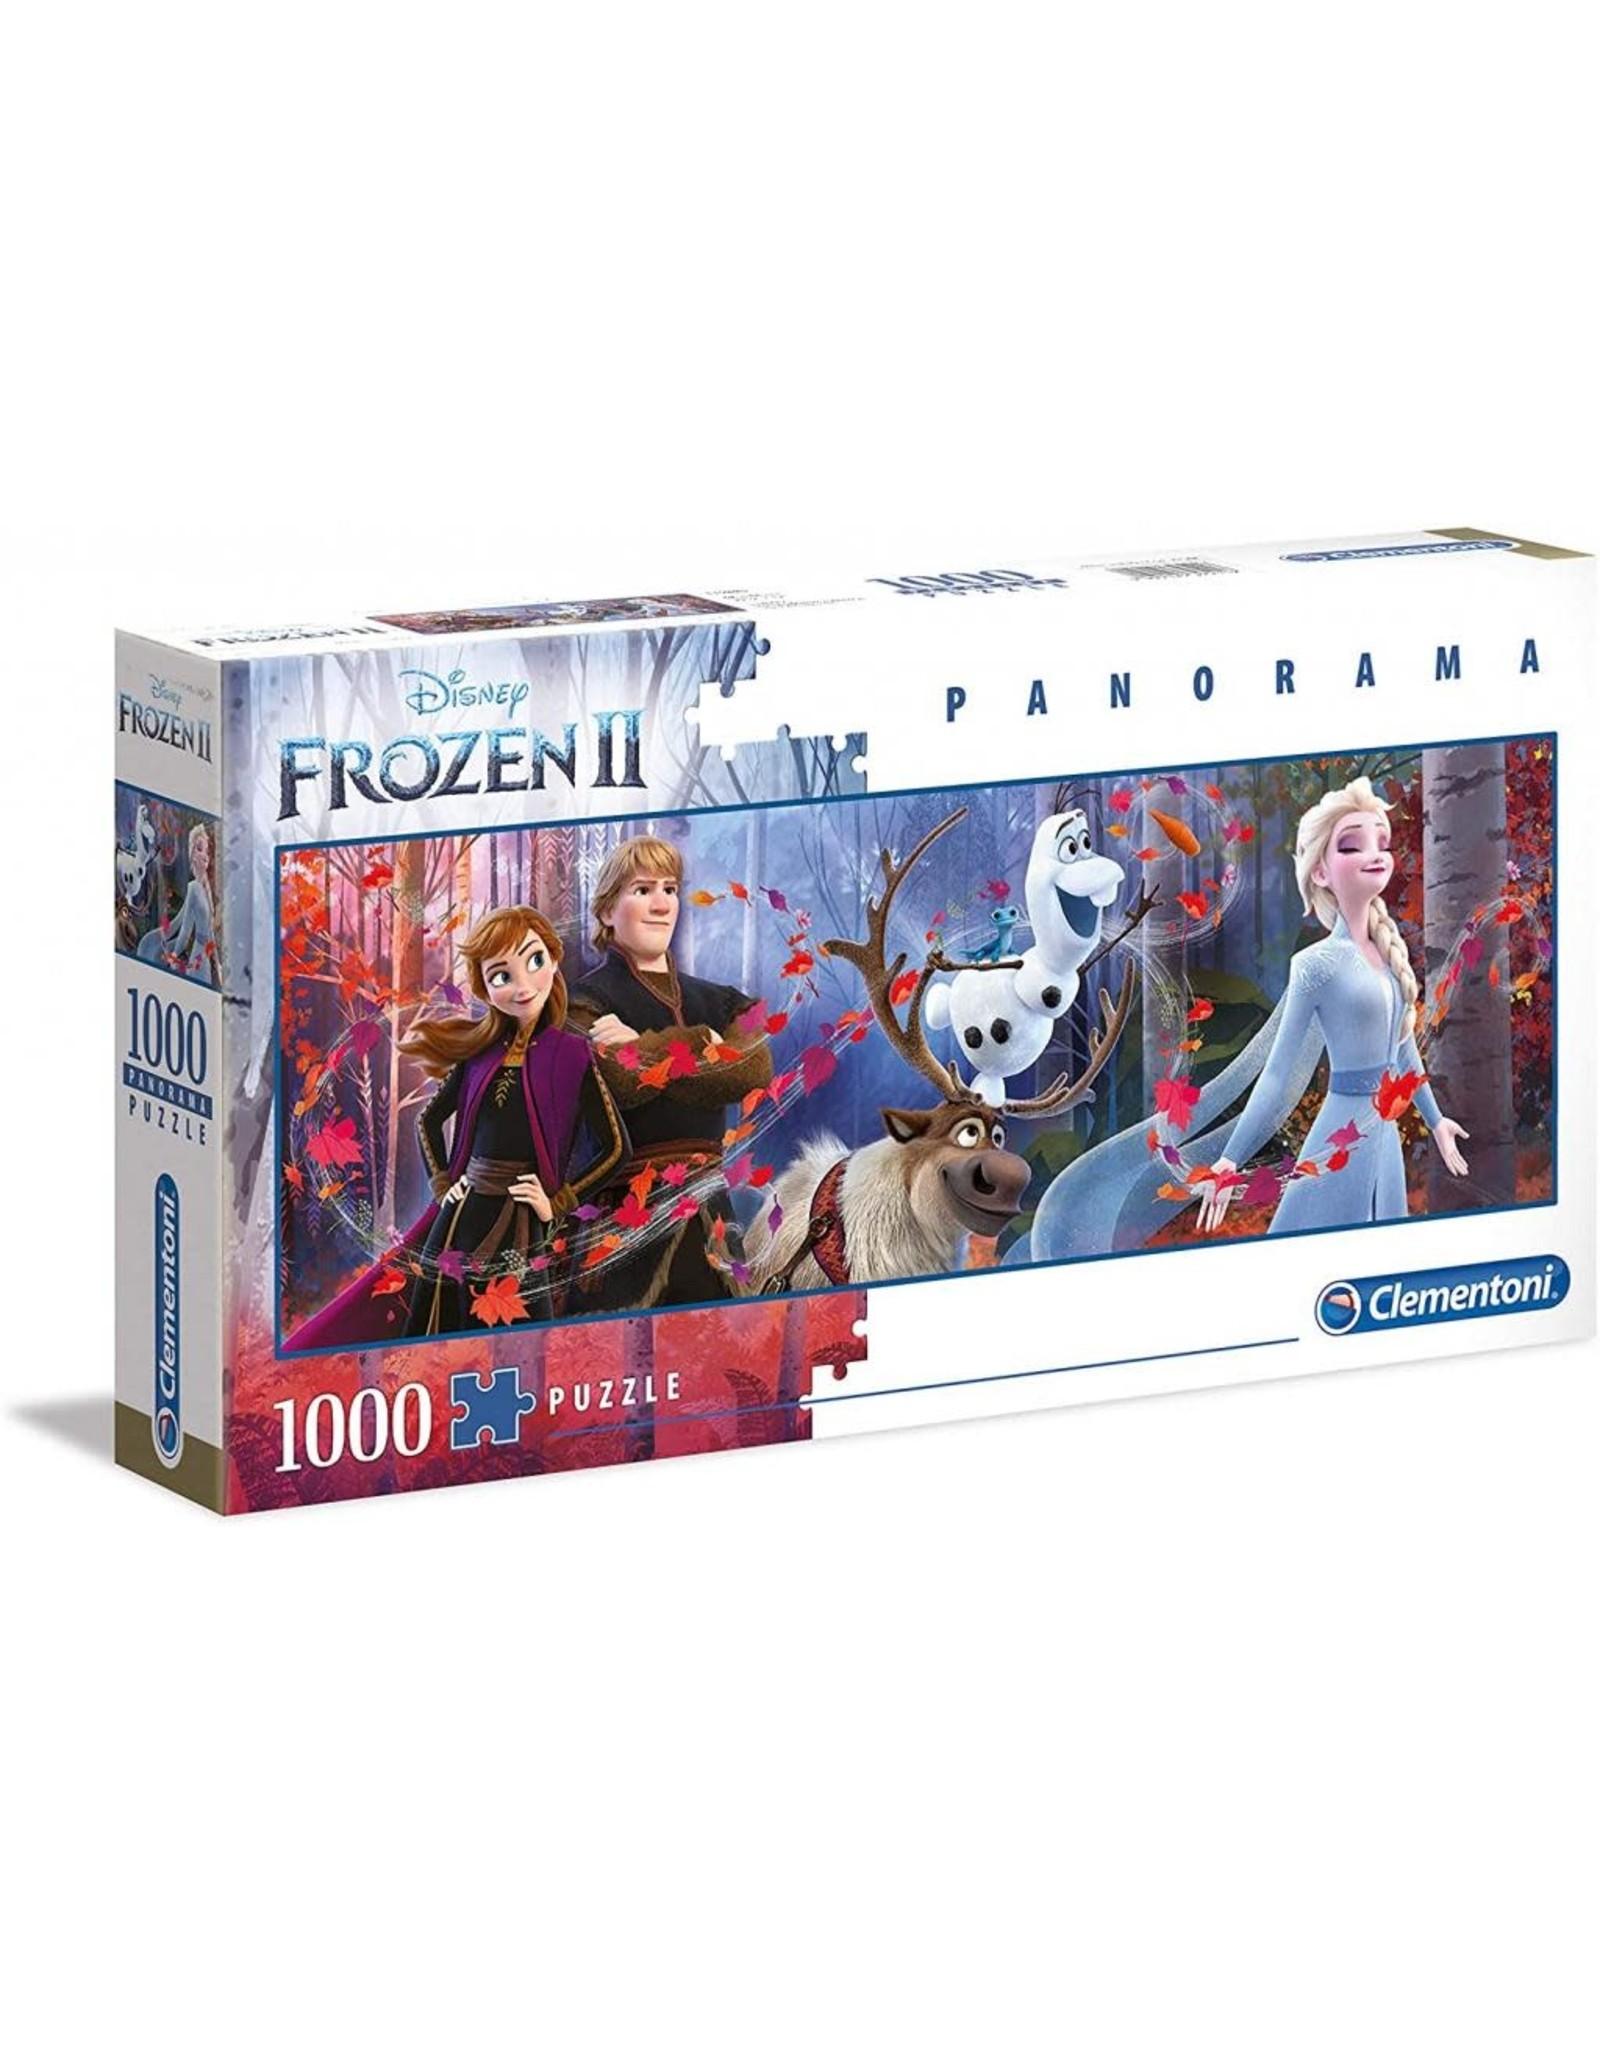 FROZEN 2 Panorama Puzzle 1000P